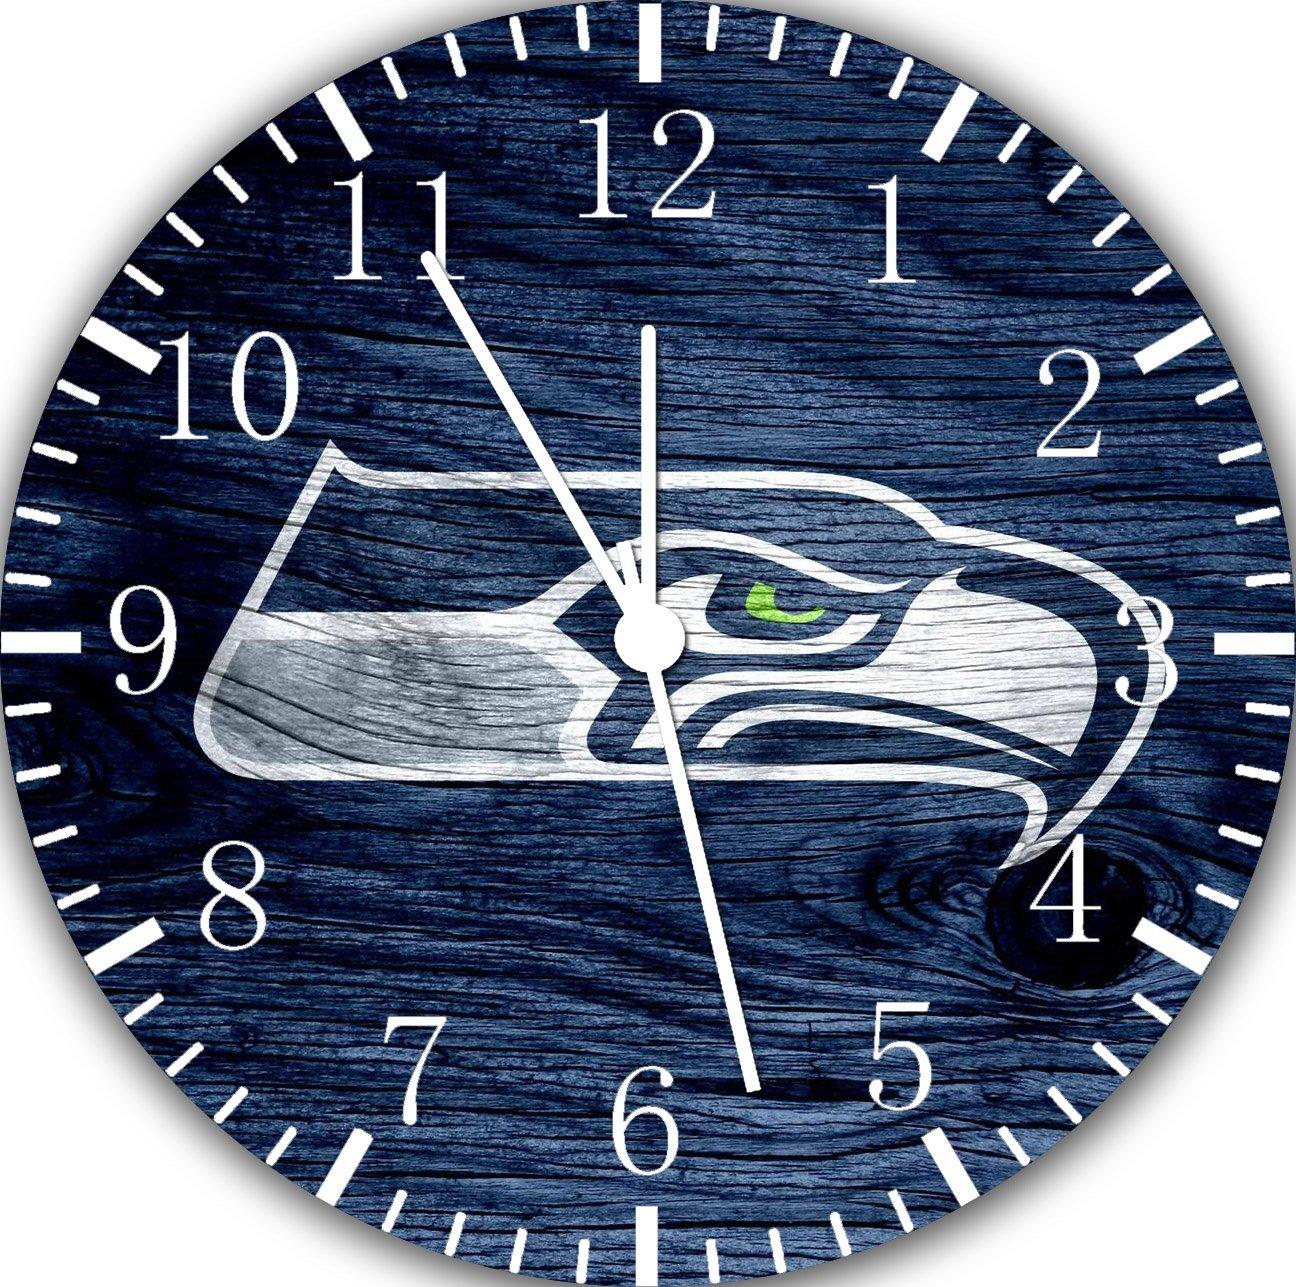 Seahawks Borderless Frameless Wall Clock E447 Nice For Decor Or Gifts